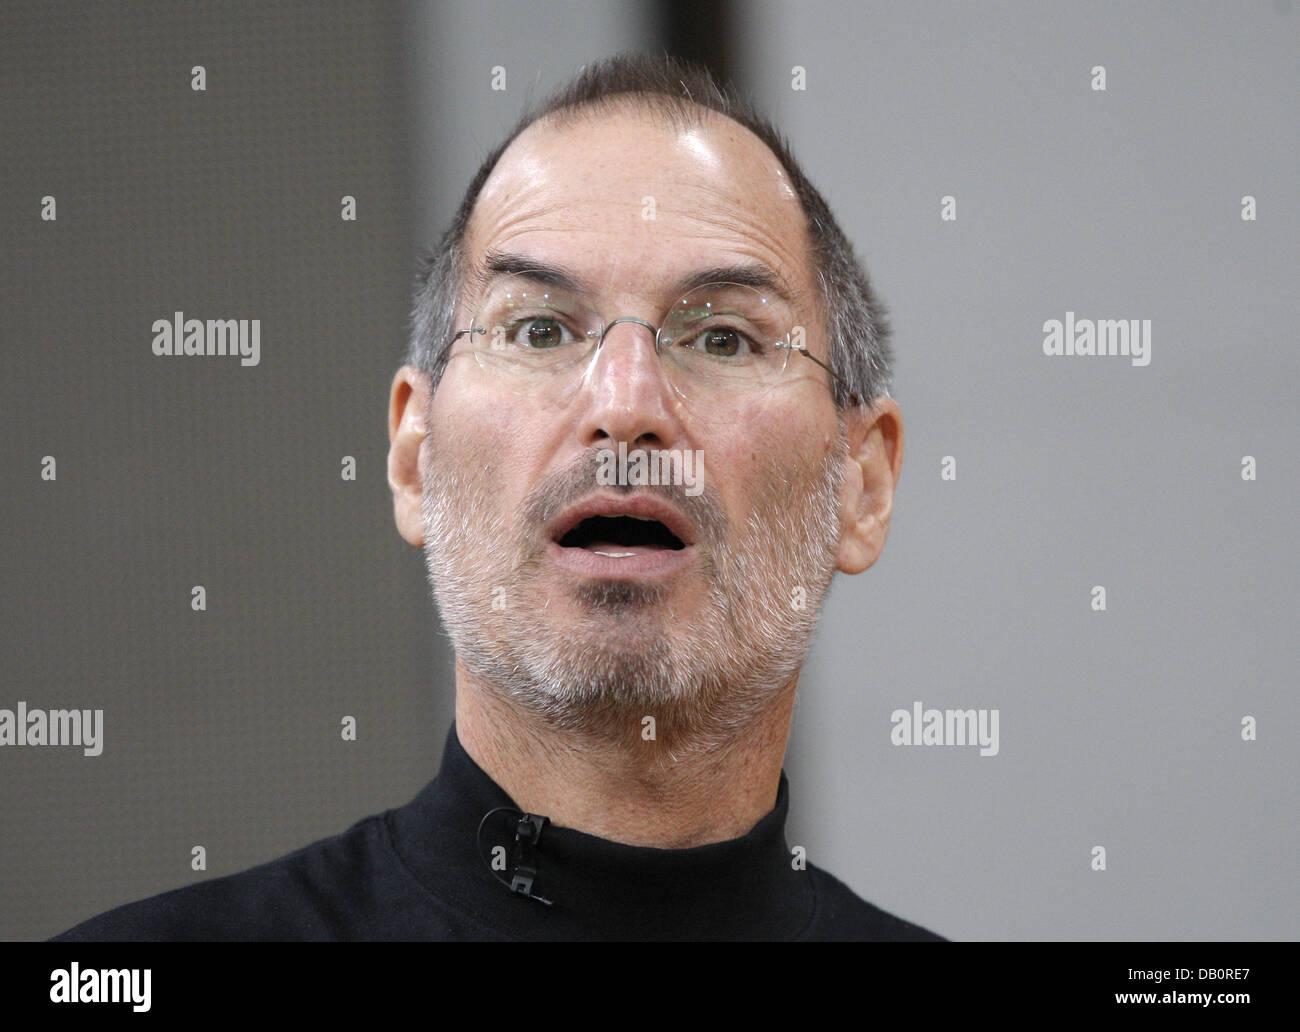 Apple CEO Steve Jobs presents the iPhone in Berlin, 19 September 2007. Deutsche Telekom obtained the exclusive marketing - Stock Image